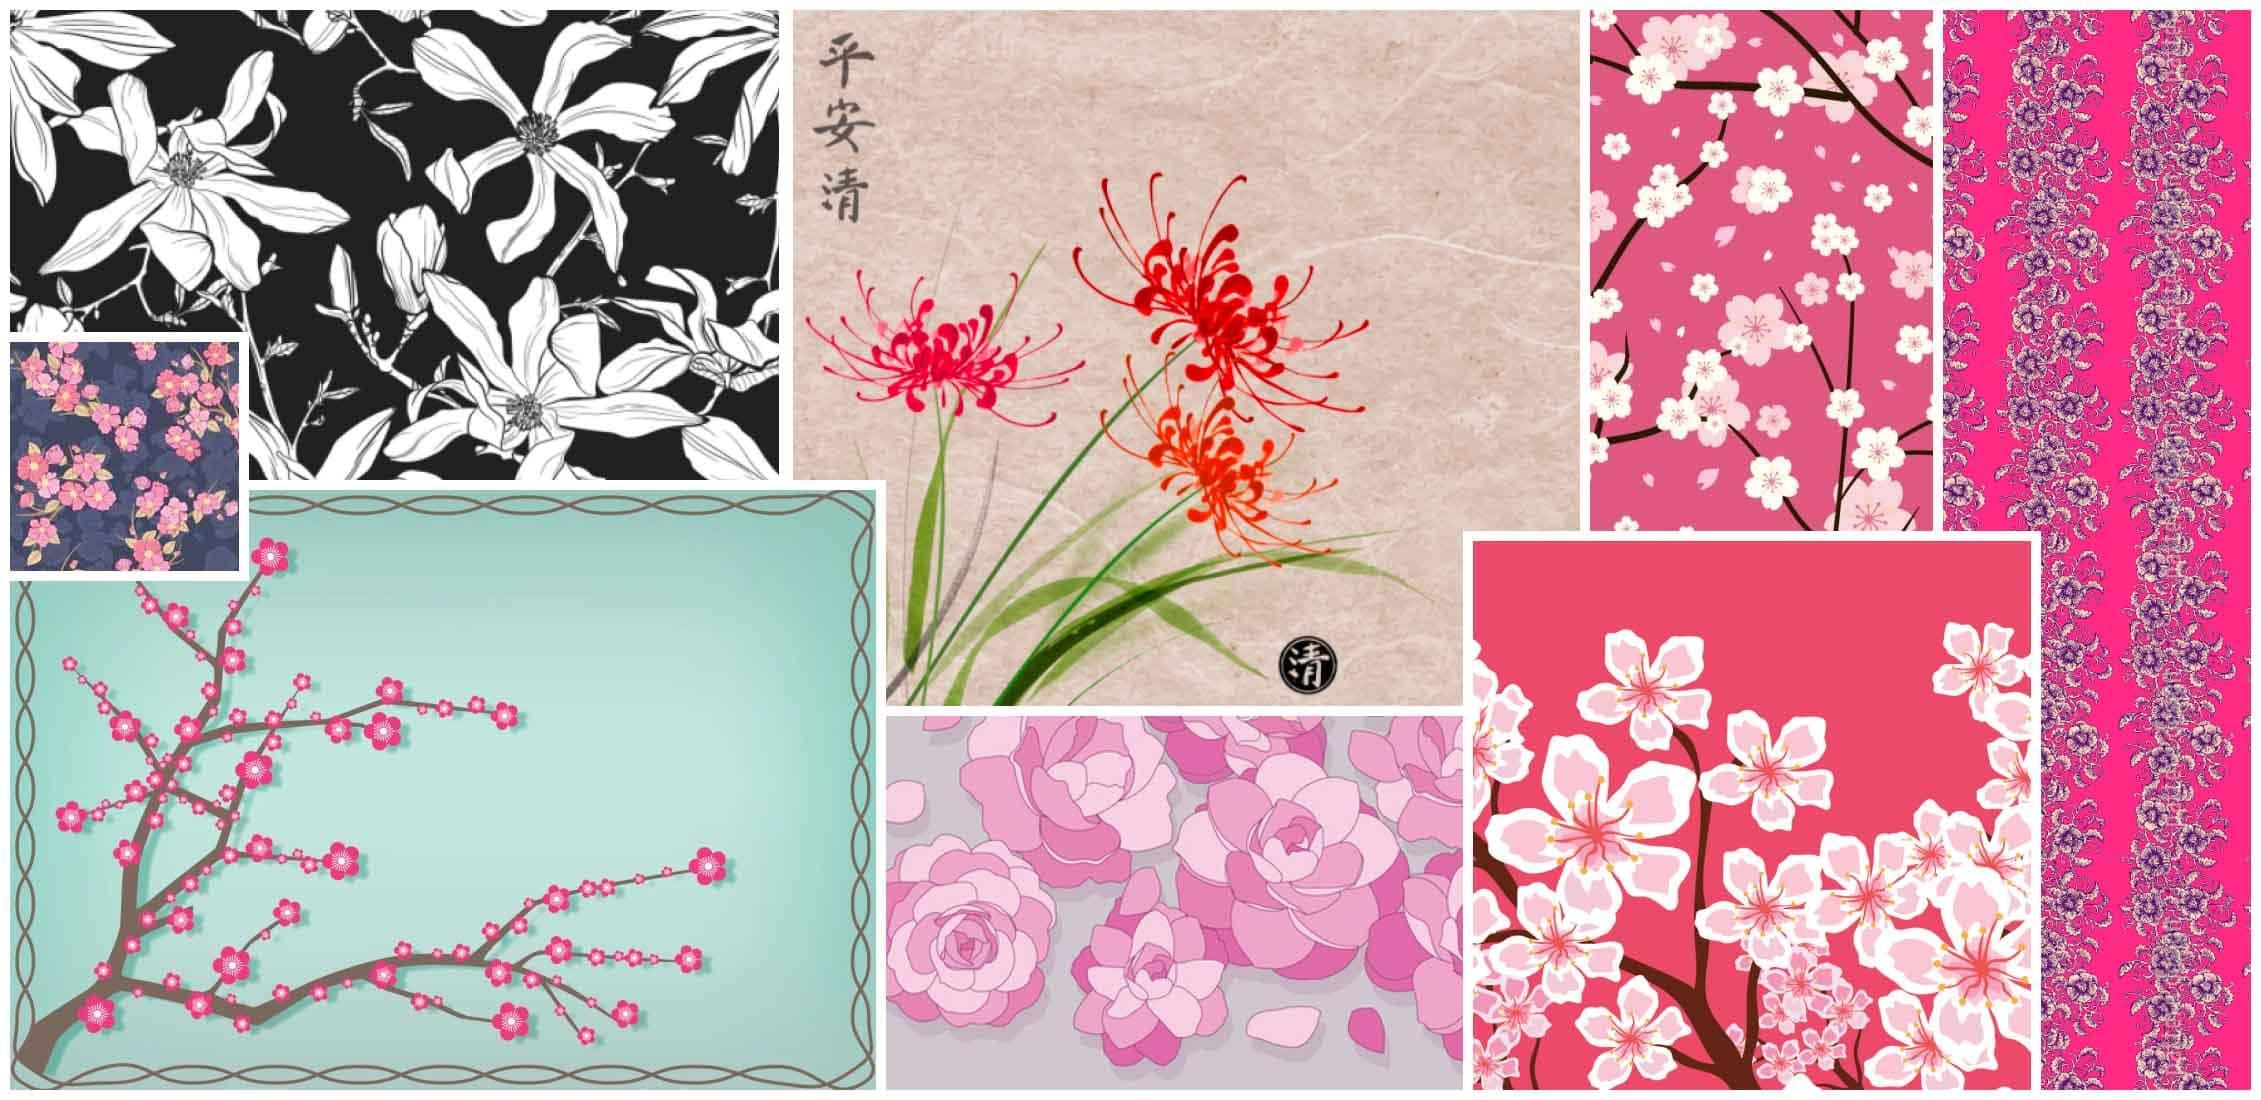 Best Japanese Flower Patterns Example.